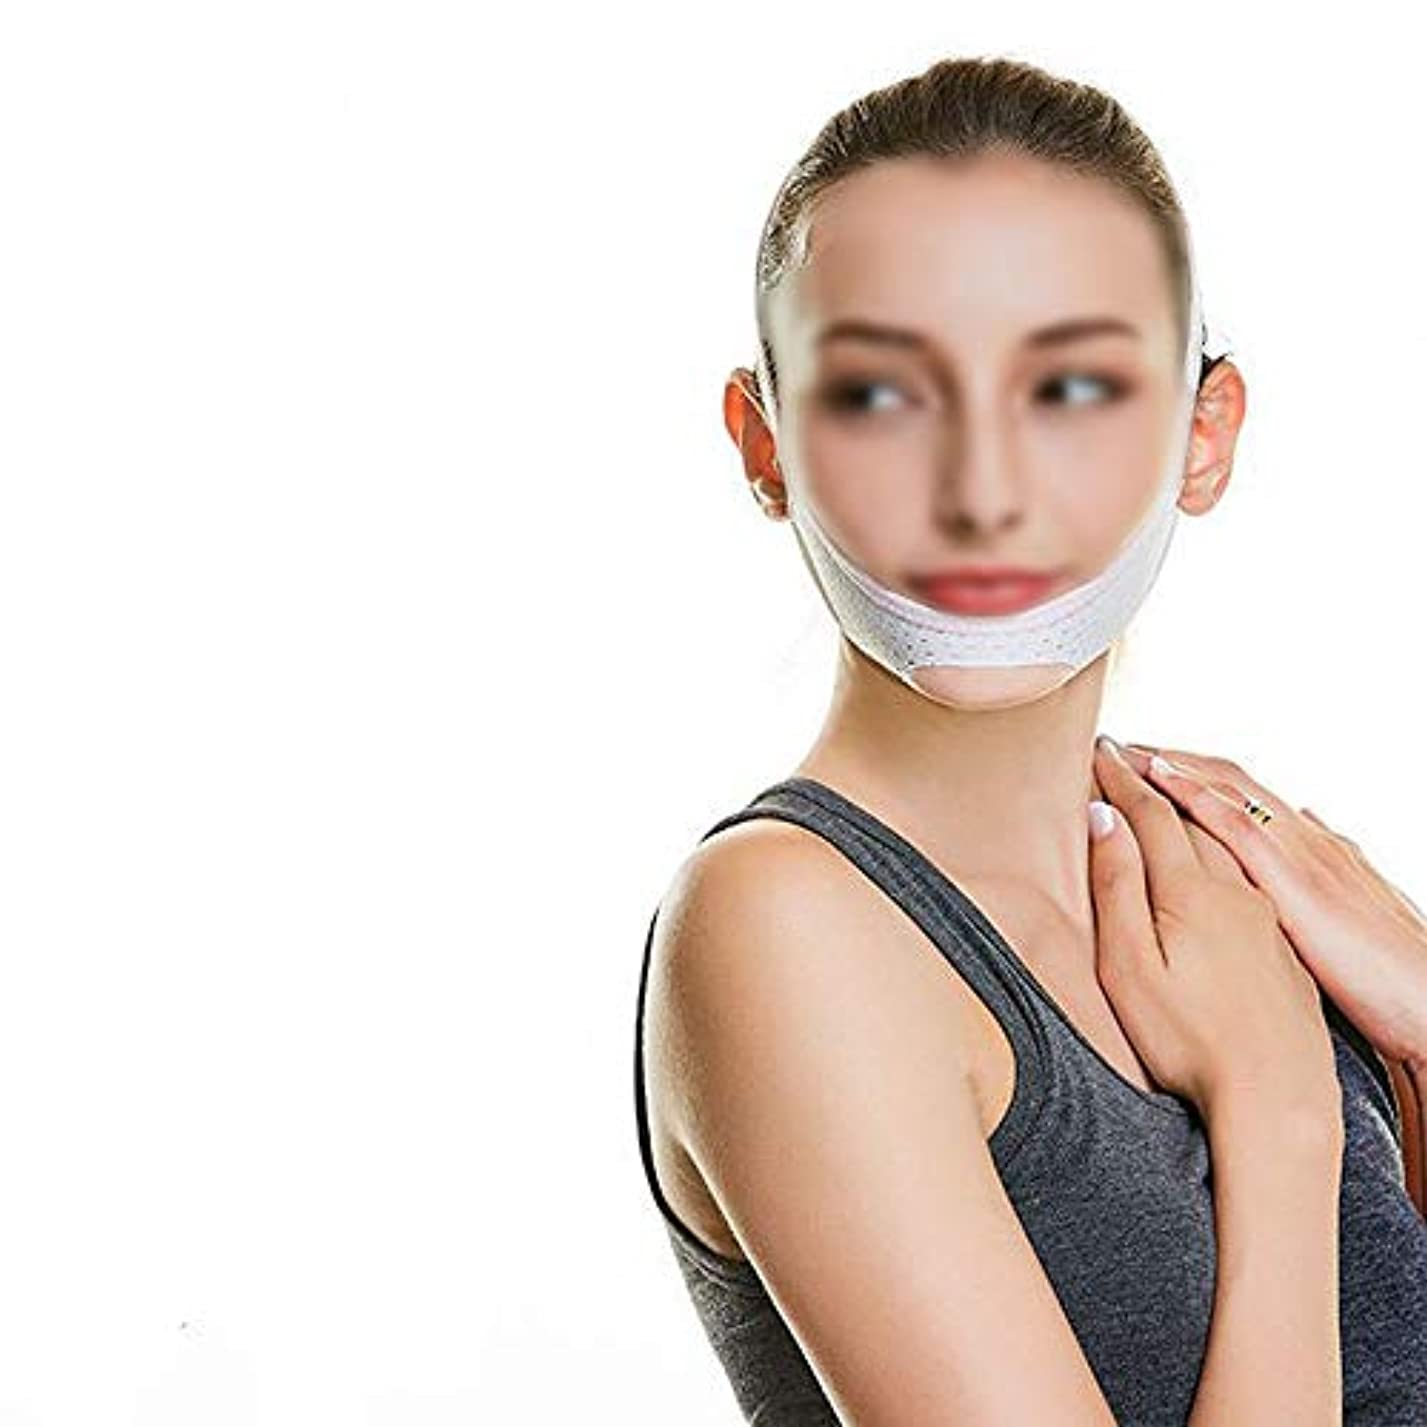 TLMY フェイスリフティング包帯回復マスクあごVフェイスリフト引き締め睡眠薄い顔アーティファクト 顔用整形マスク